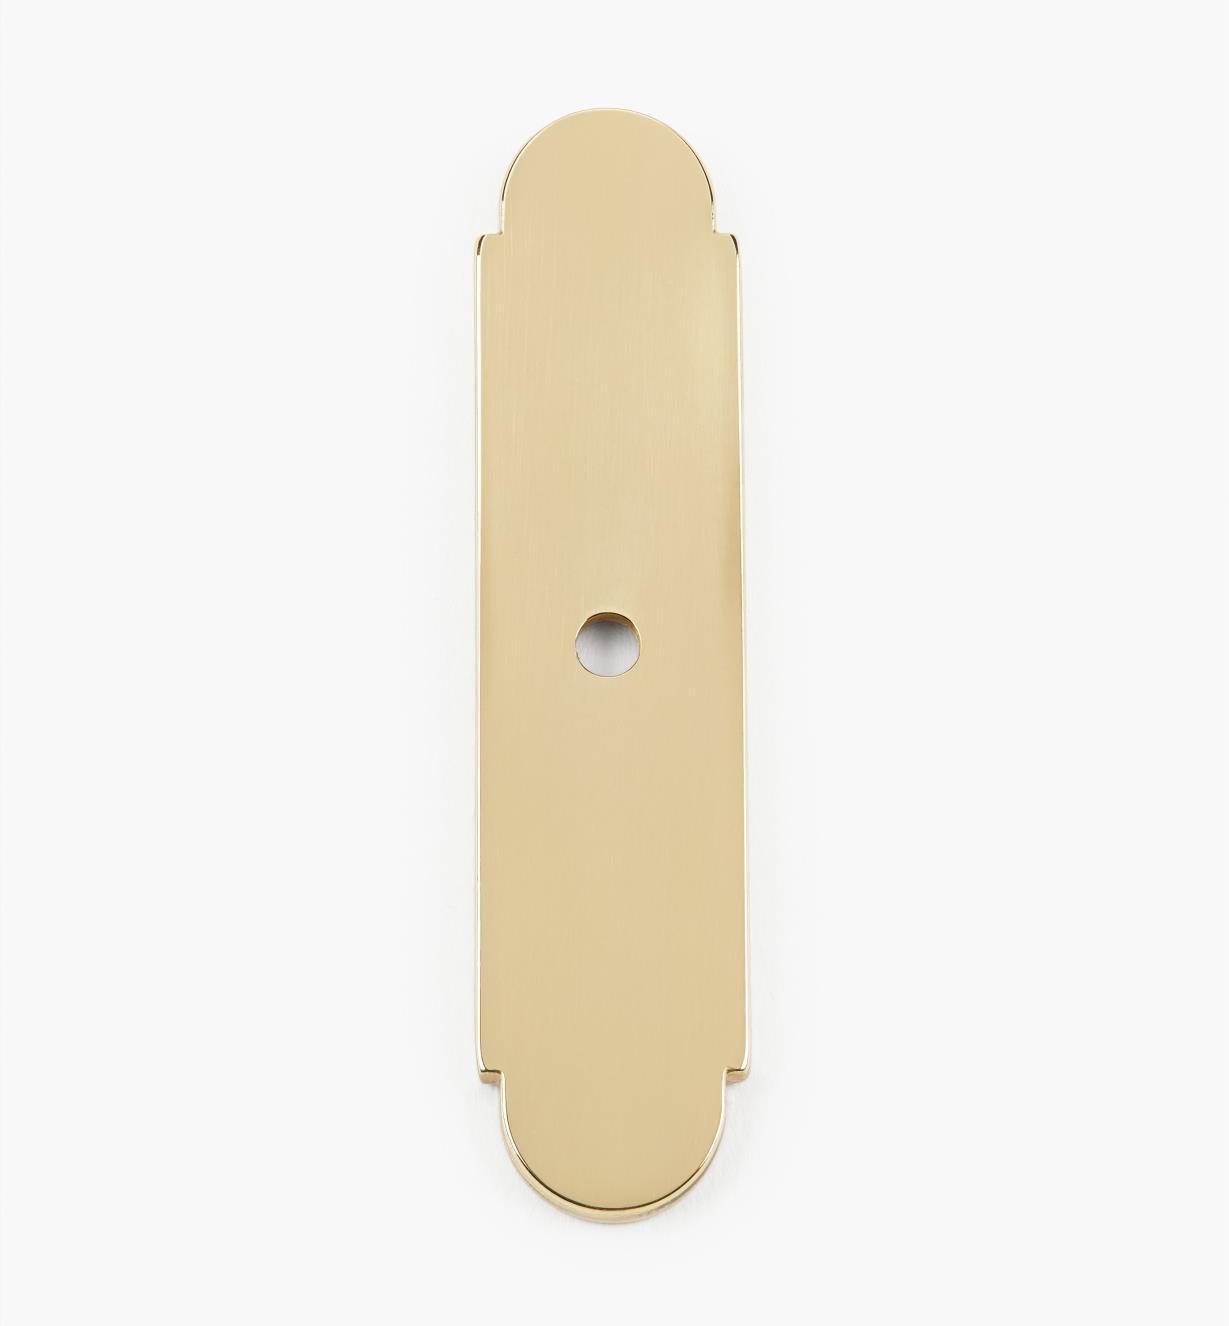 00W8835 - Brass Knob Escutcheon